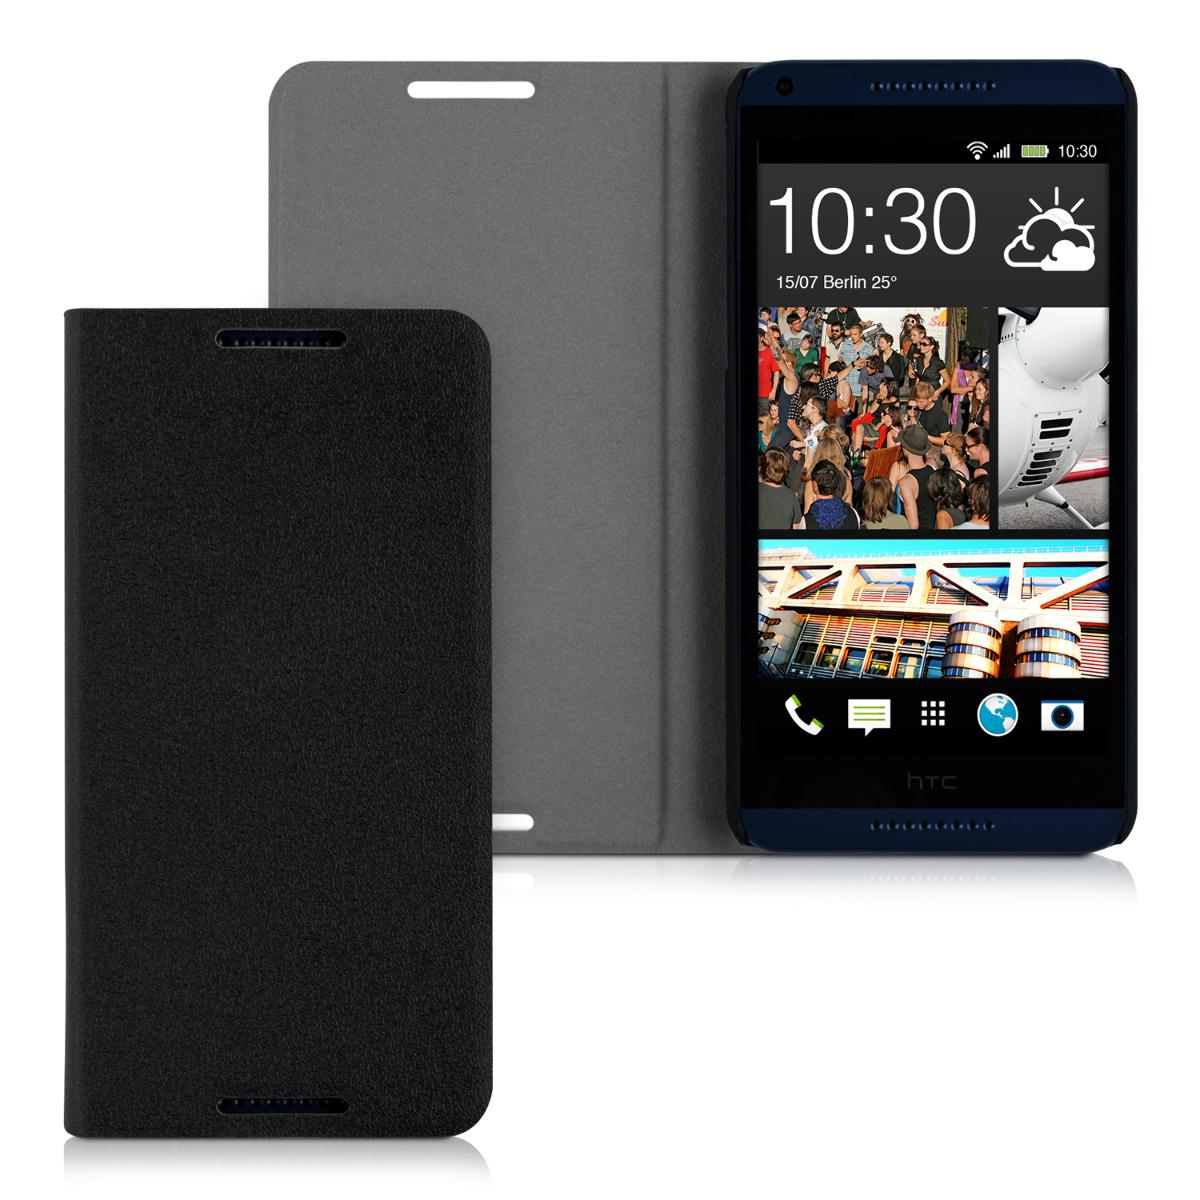 kwmobile flip cover for htc desire 816 case slim back shell hard mobile phone ebay. Black Bedroom Furniture Sets. Home Design Ideas